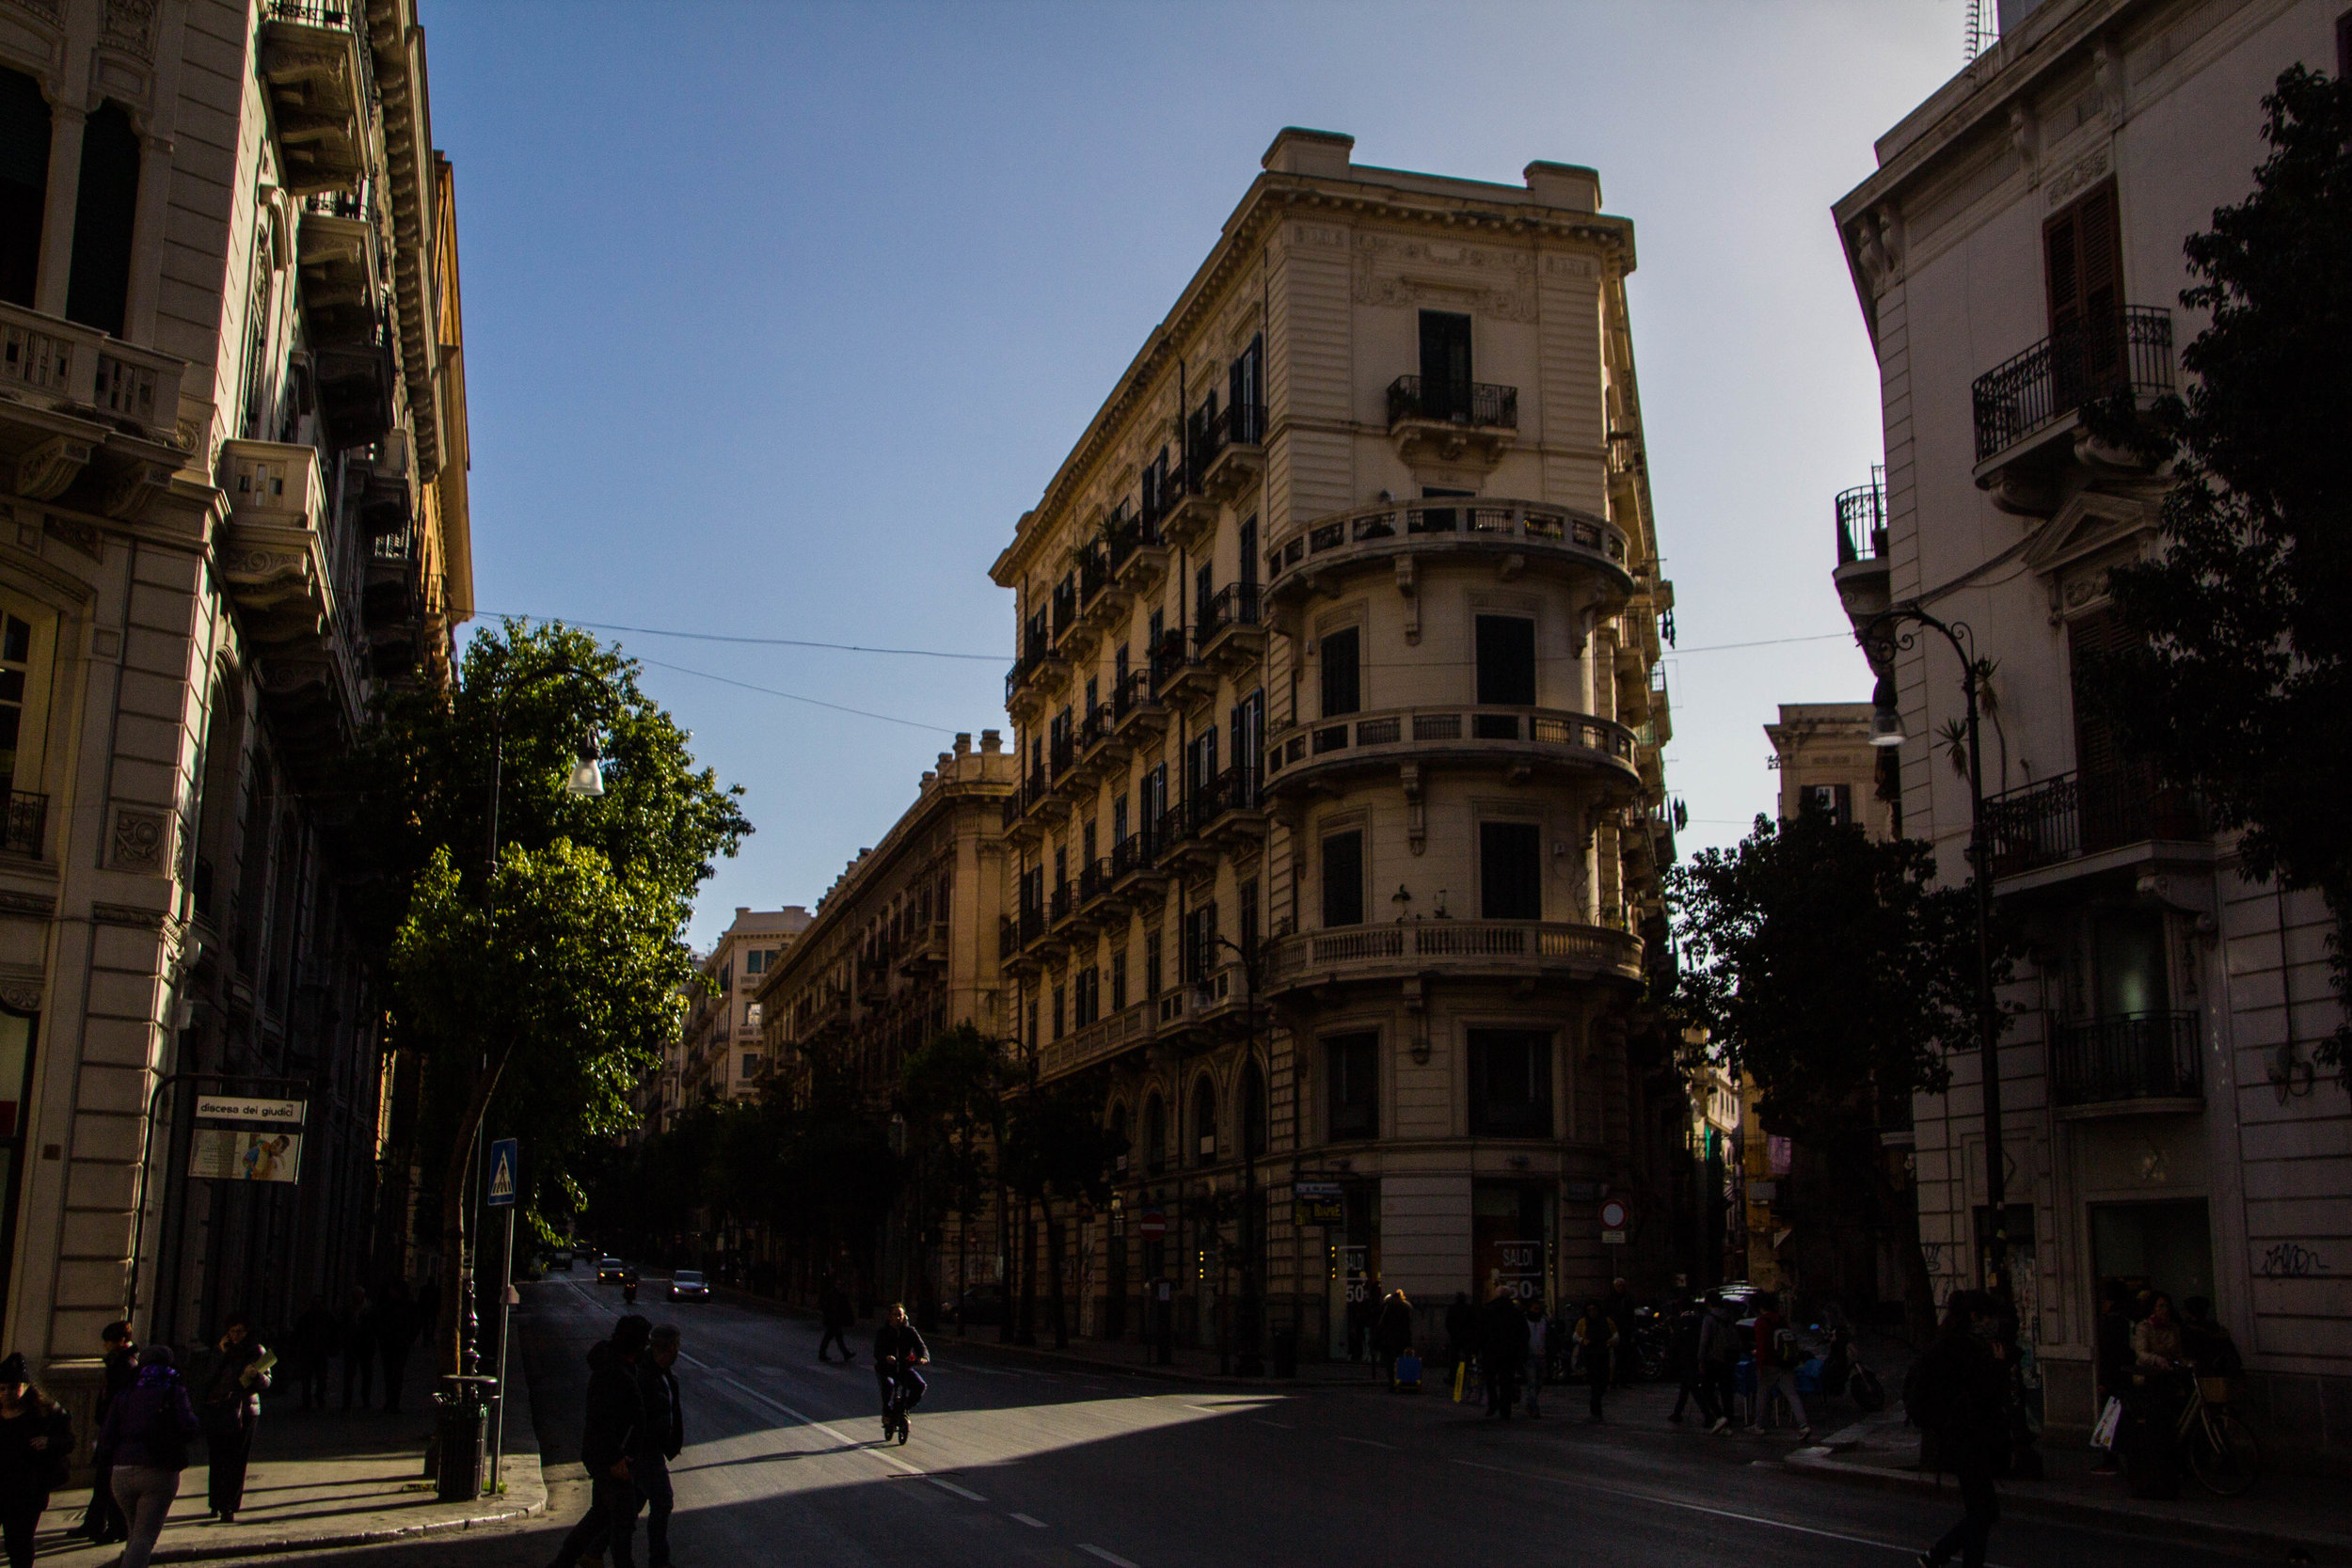 streets-palermo-sicily-5.jpg